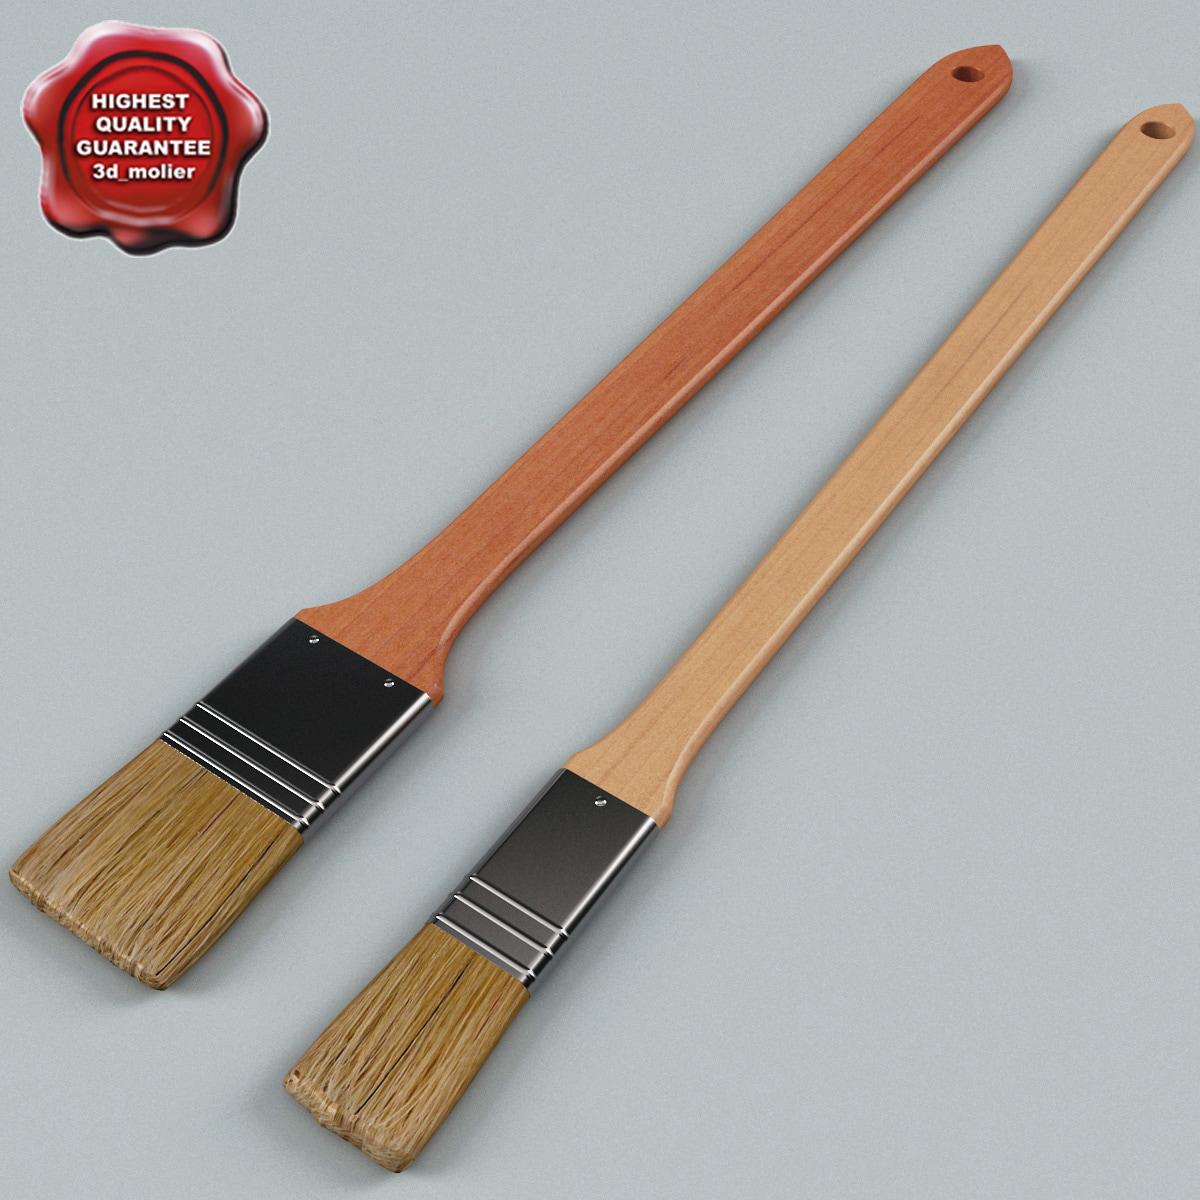 paint brushes v4 3d c4d